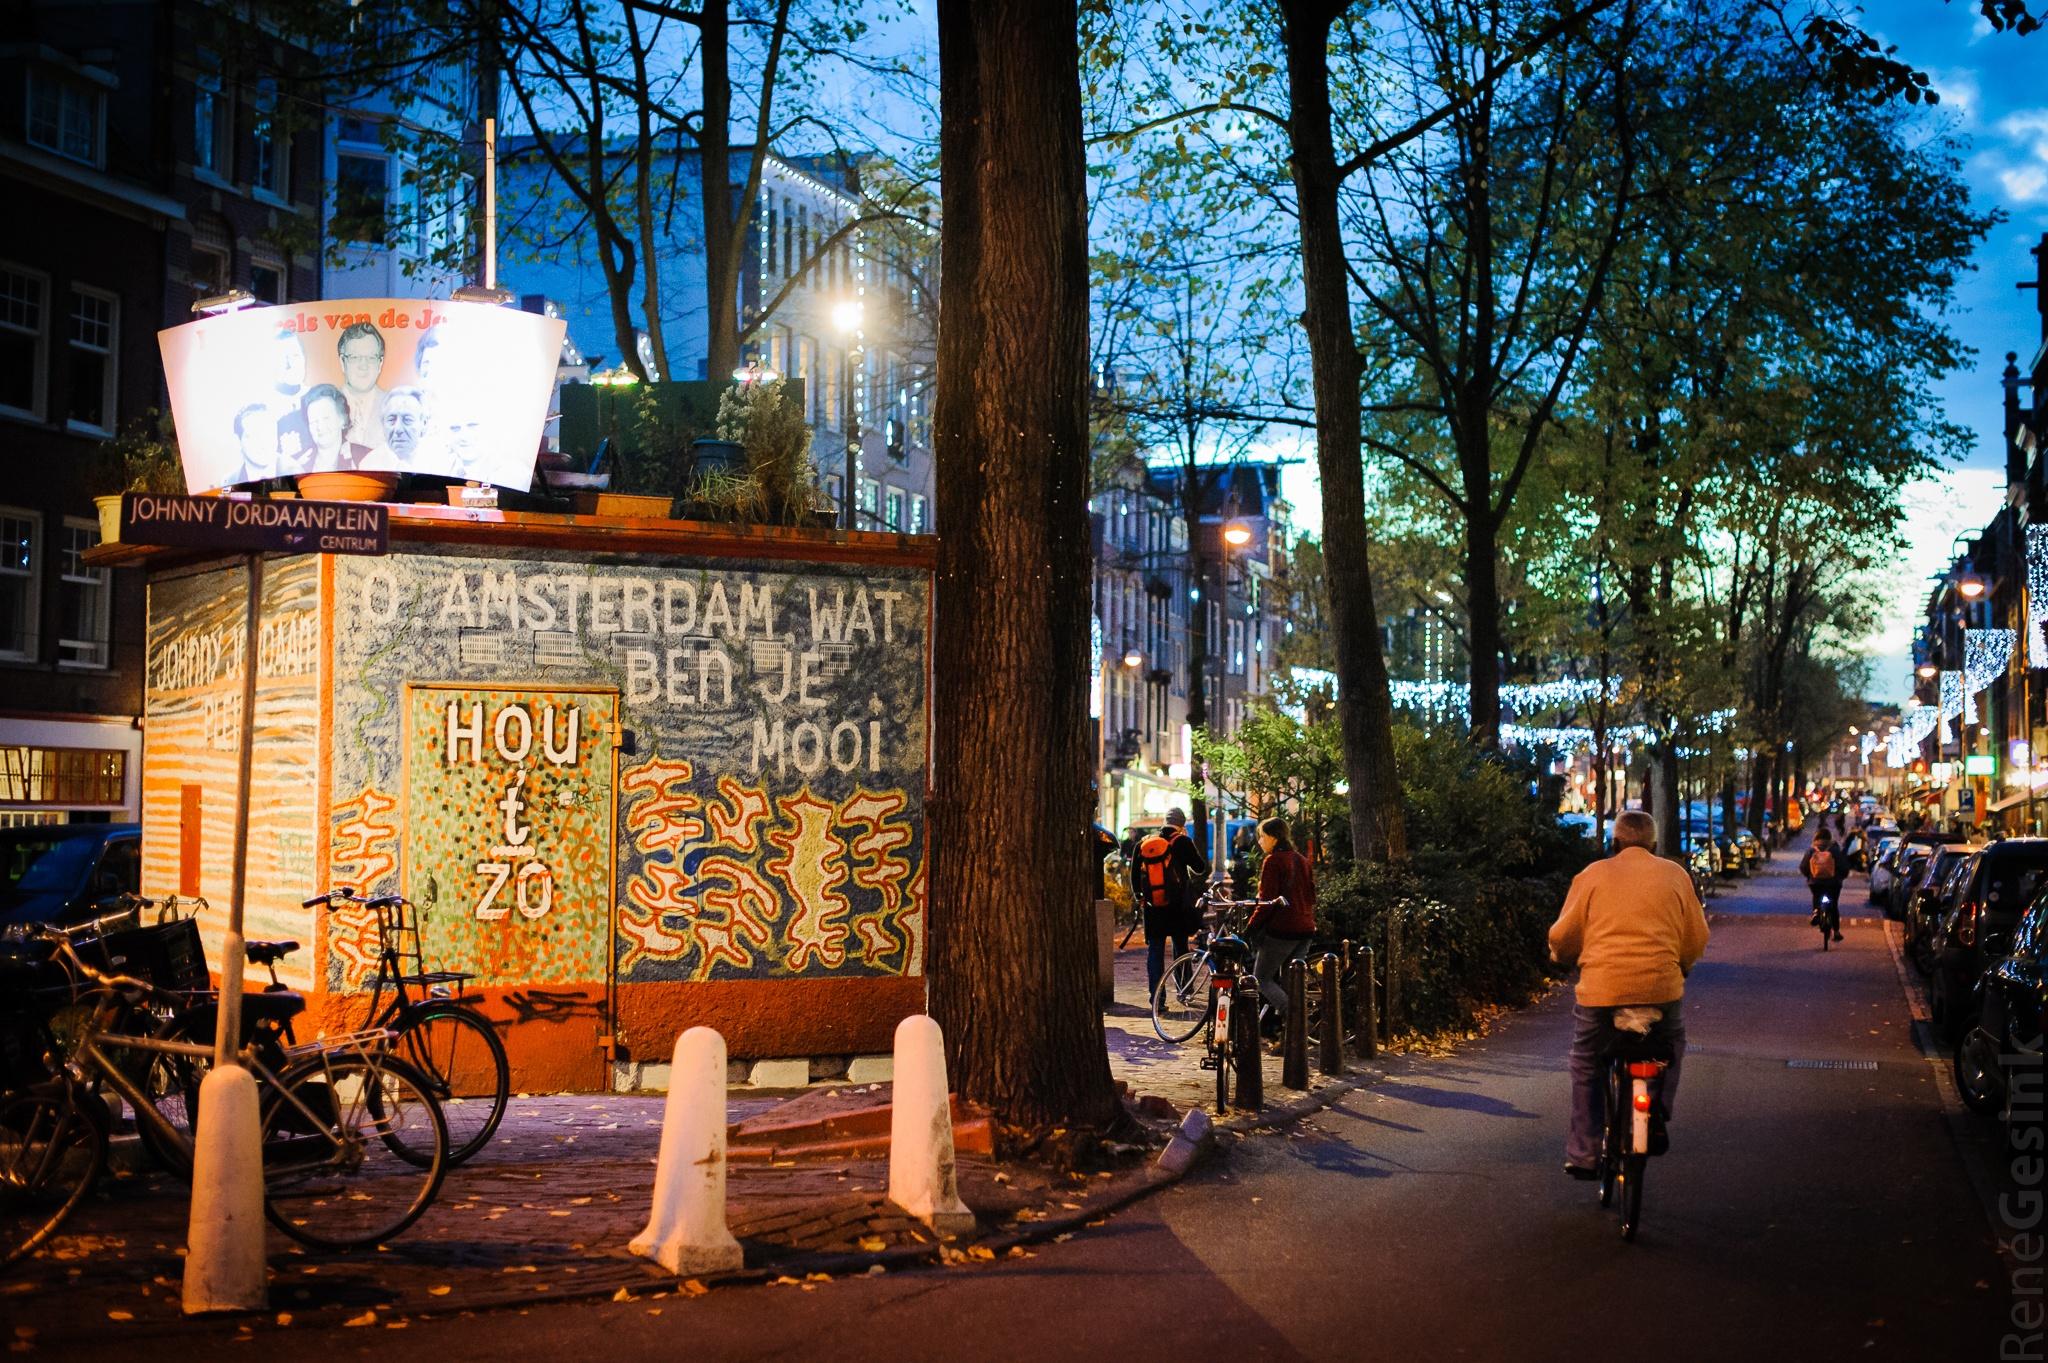 O, Amsterdam wat ben je mooi